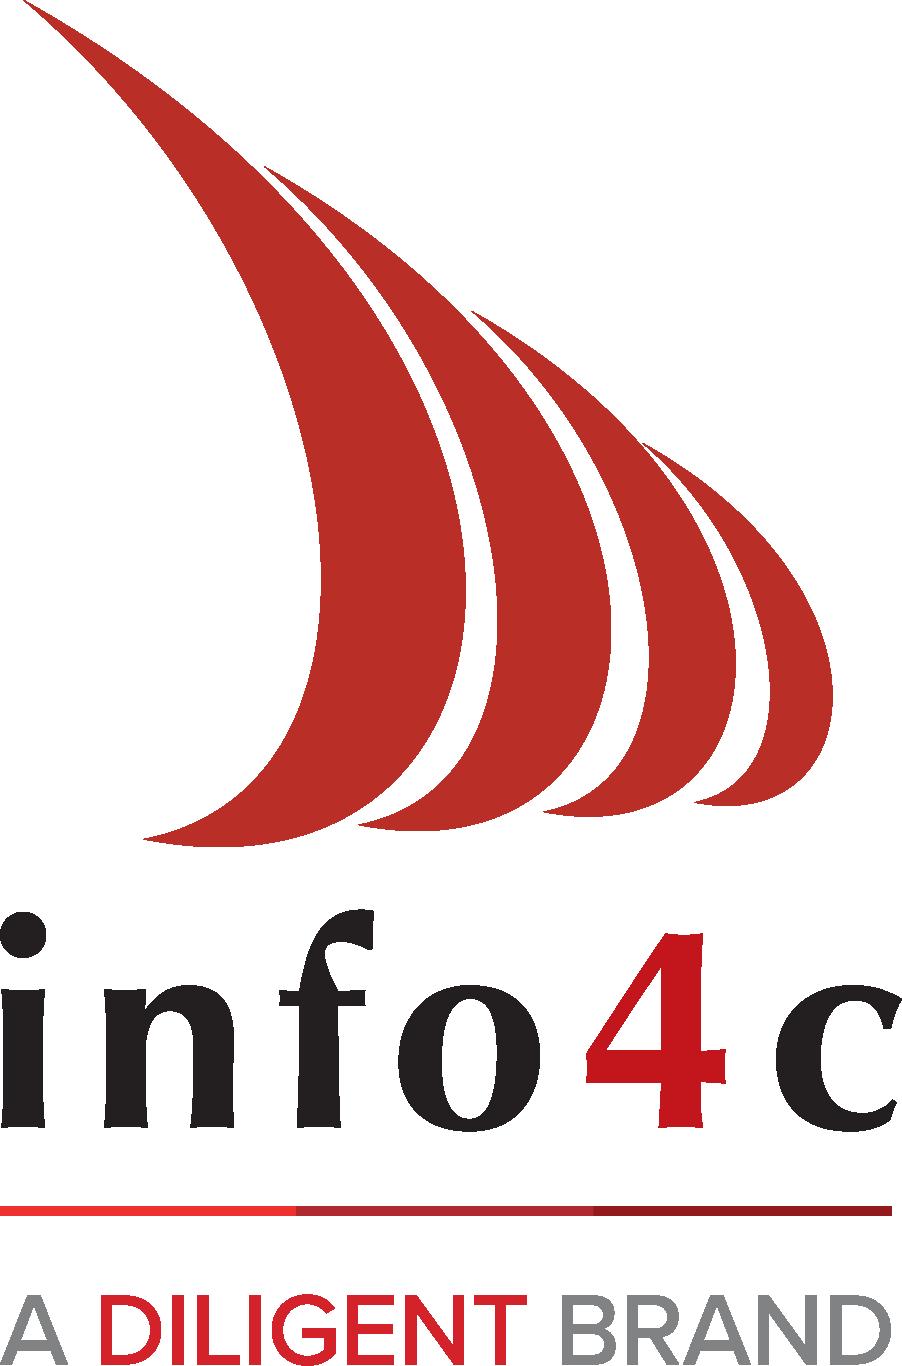 info4c color logo